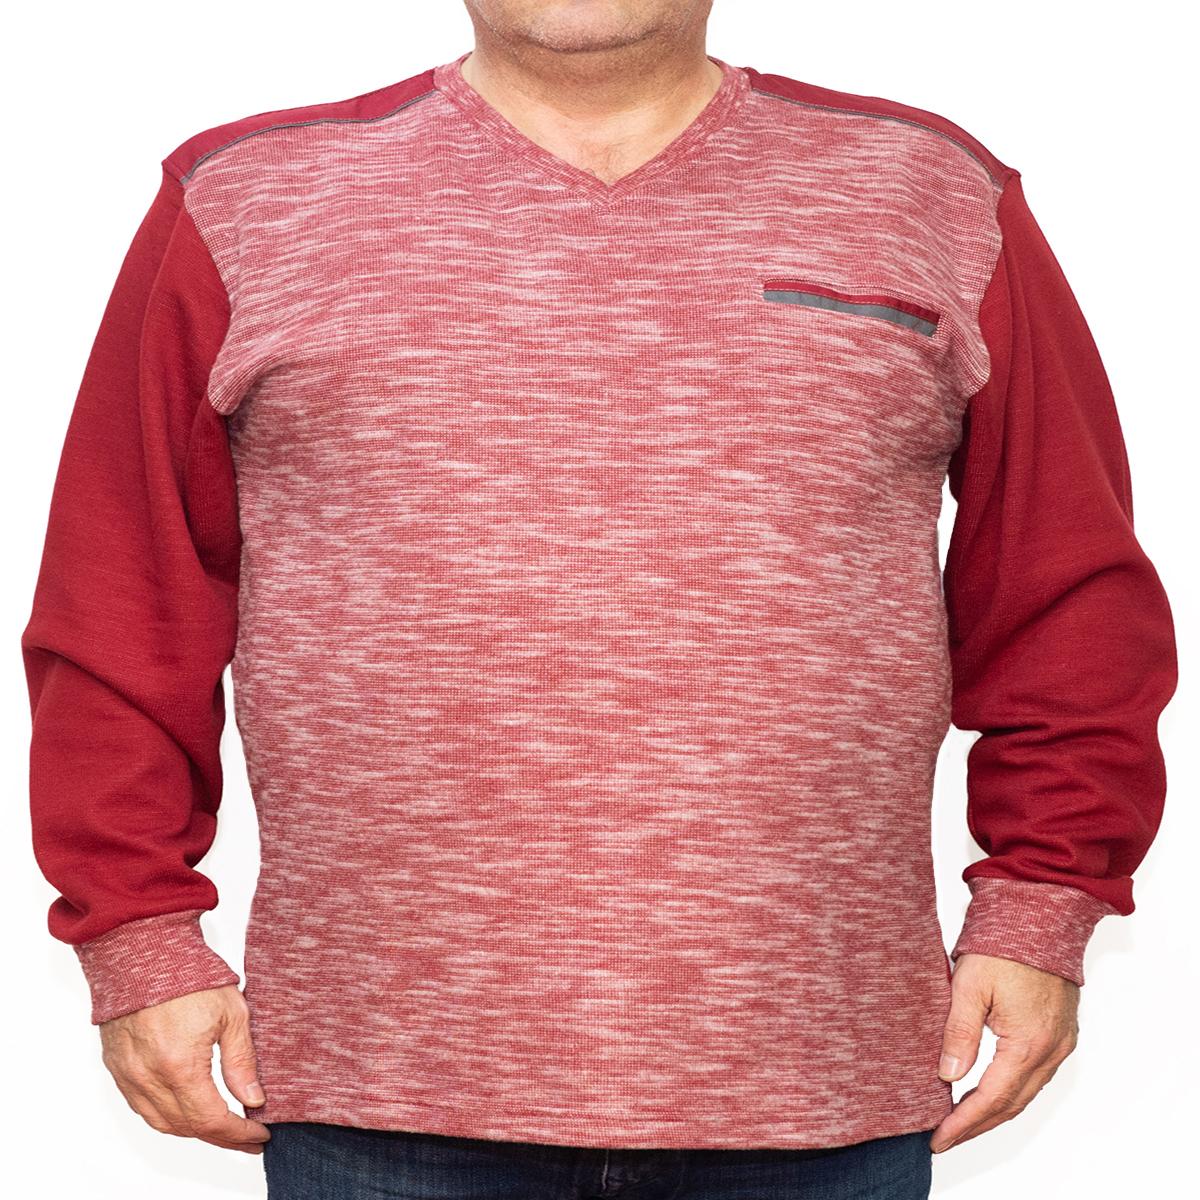 Bluza groasa rosie cu imprimeu si cu anchior, Marime 4XL - egato.ro